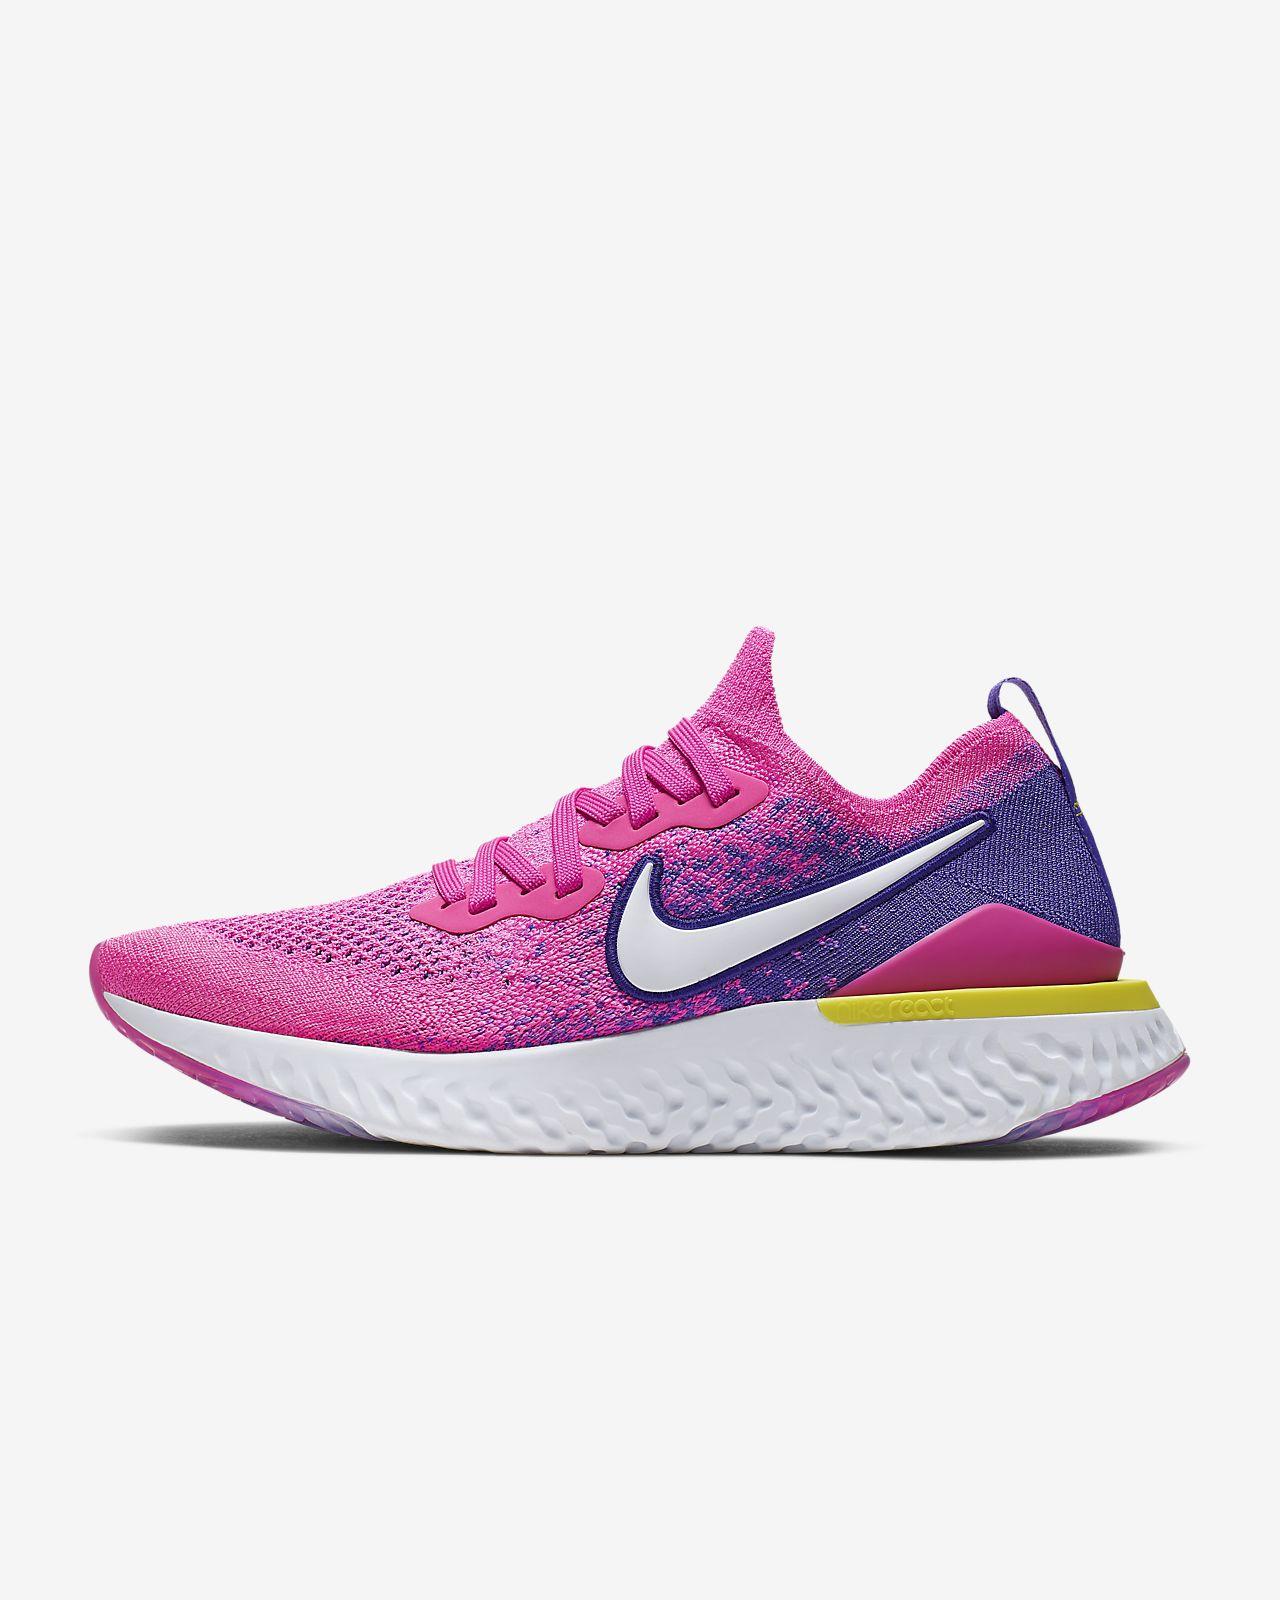 official photos 407ba 99724 Nike Epic React Flyknit 2 Women's Running Shoe